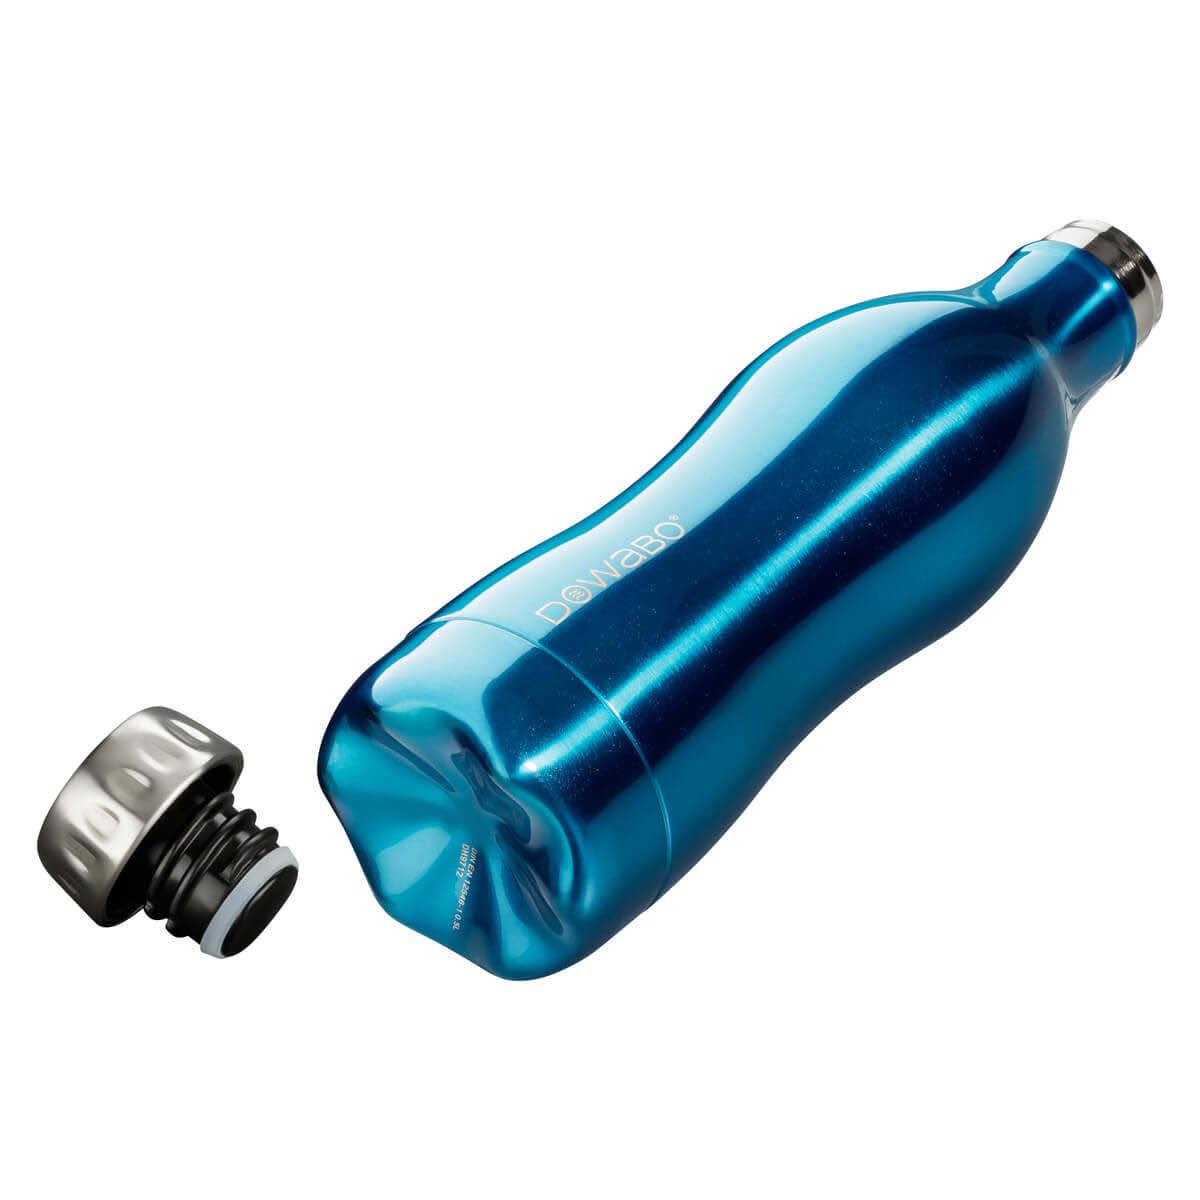 DOWABO Metallic Collection Blue 500 ml